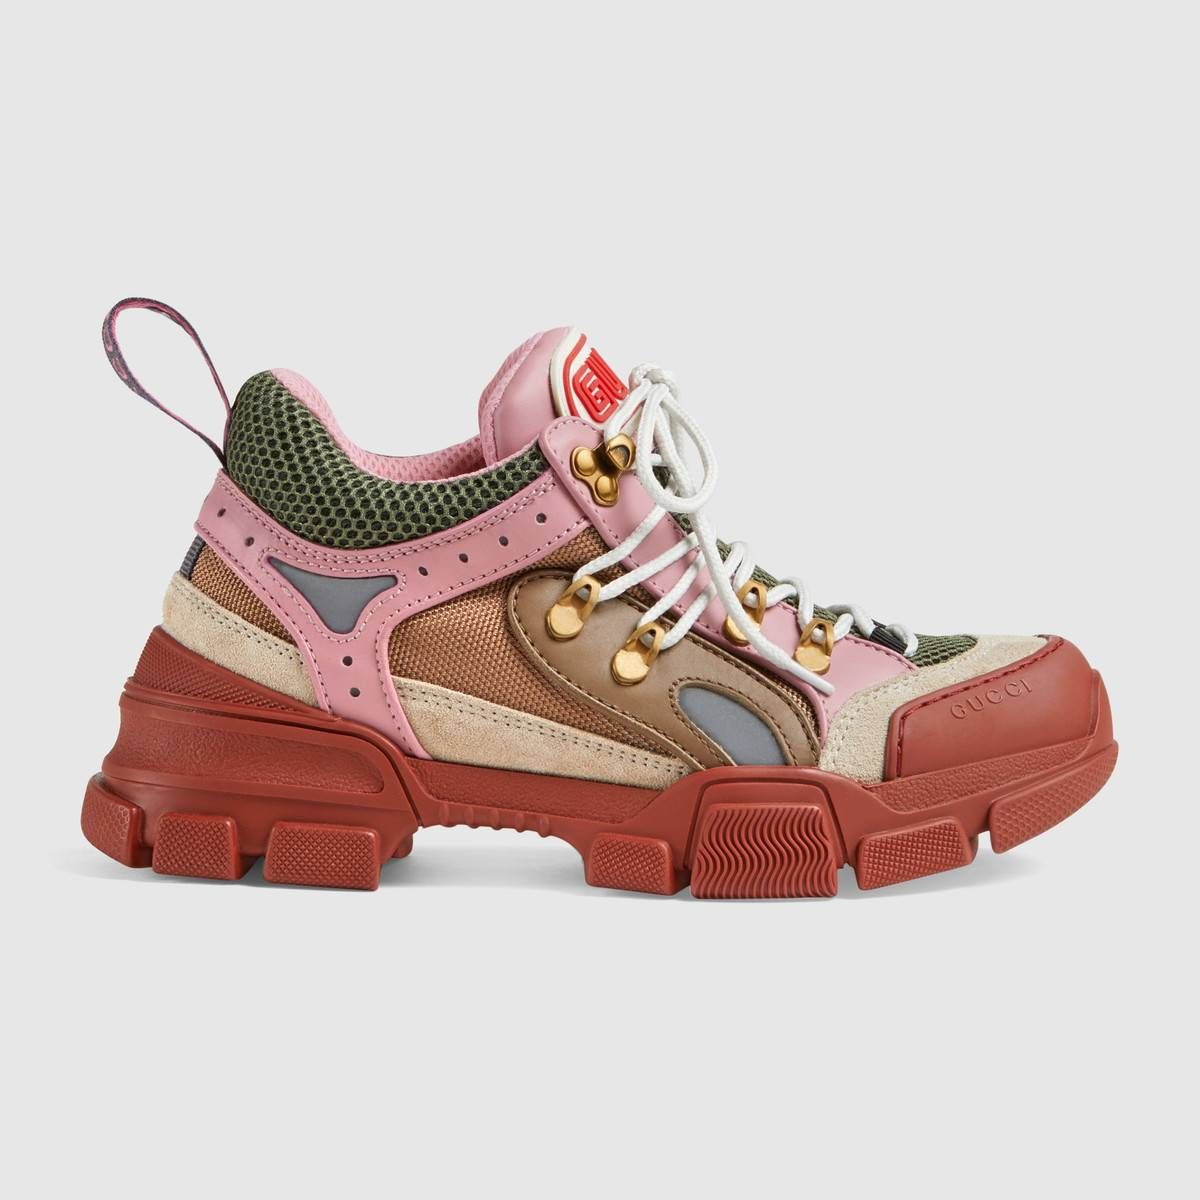 22e41b95f82 Flashtrek Shoes En 2019 Zapatilla Pinterest Deportiva FxqRIw45zI